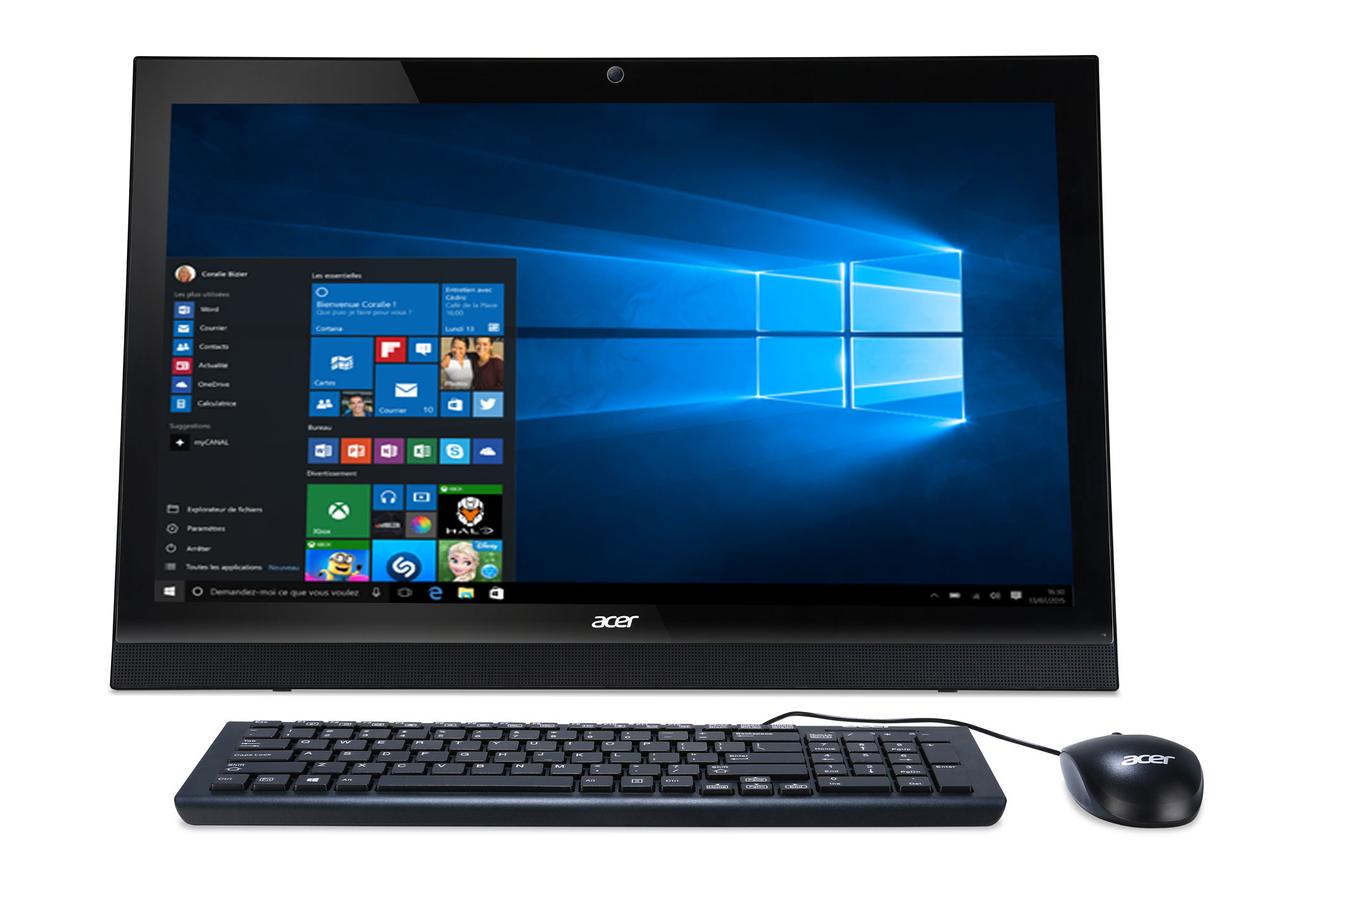 Pc De Bureau Acer Aspire Z1 623 4169794 Darty